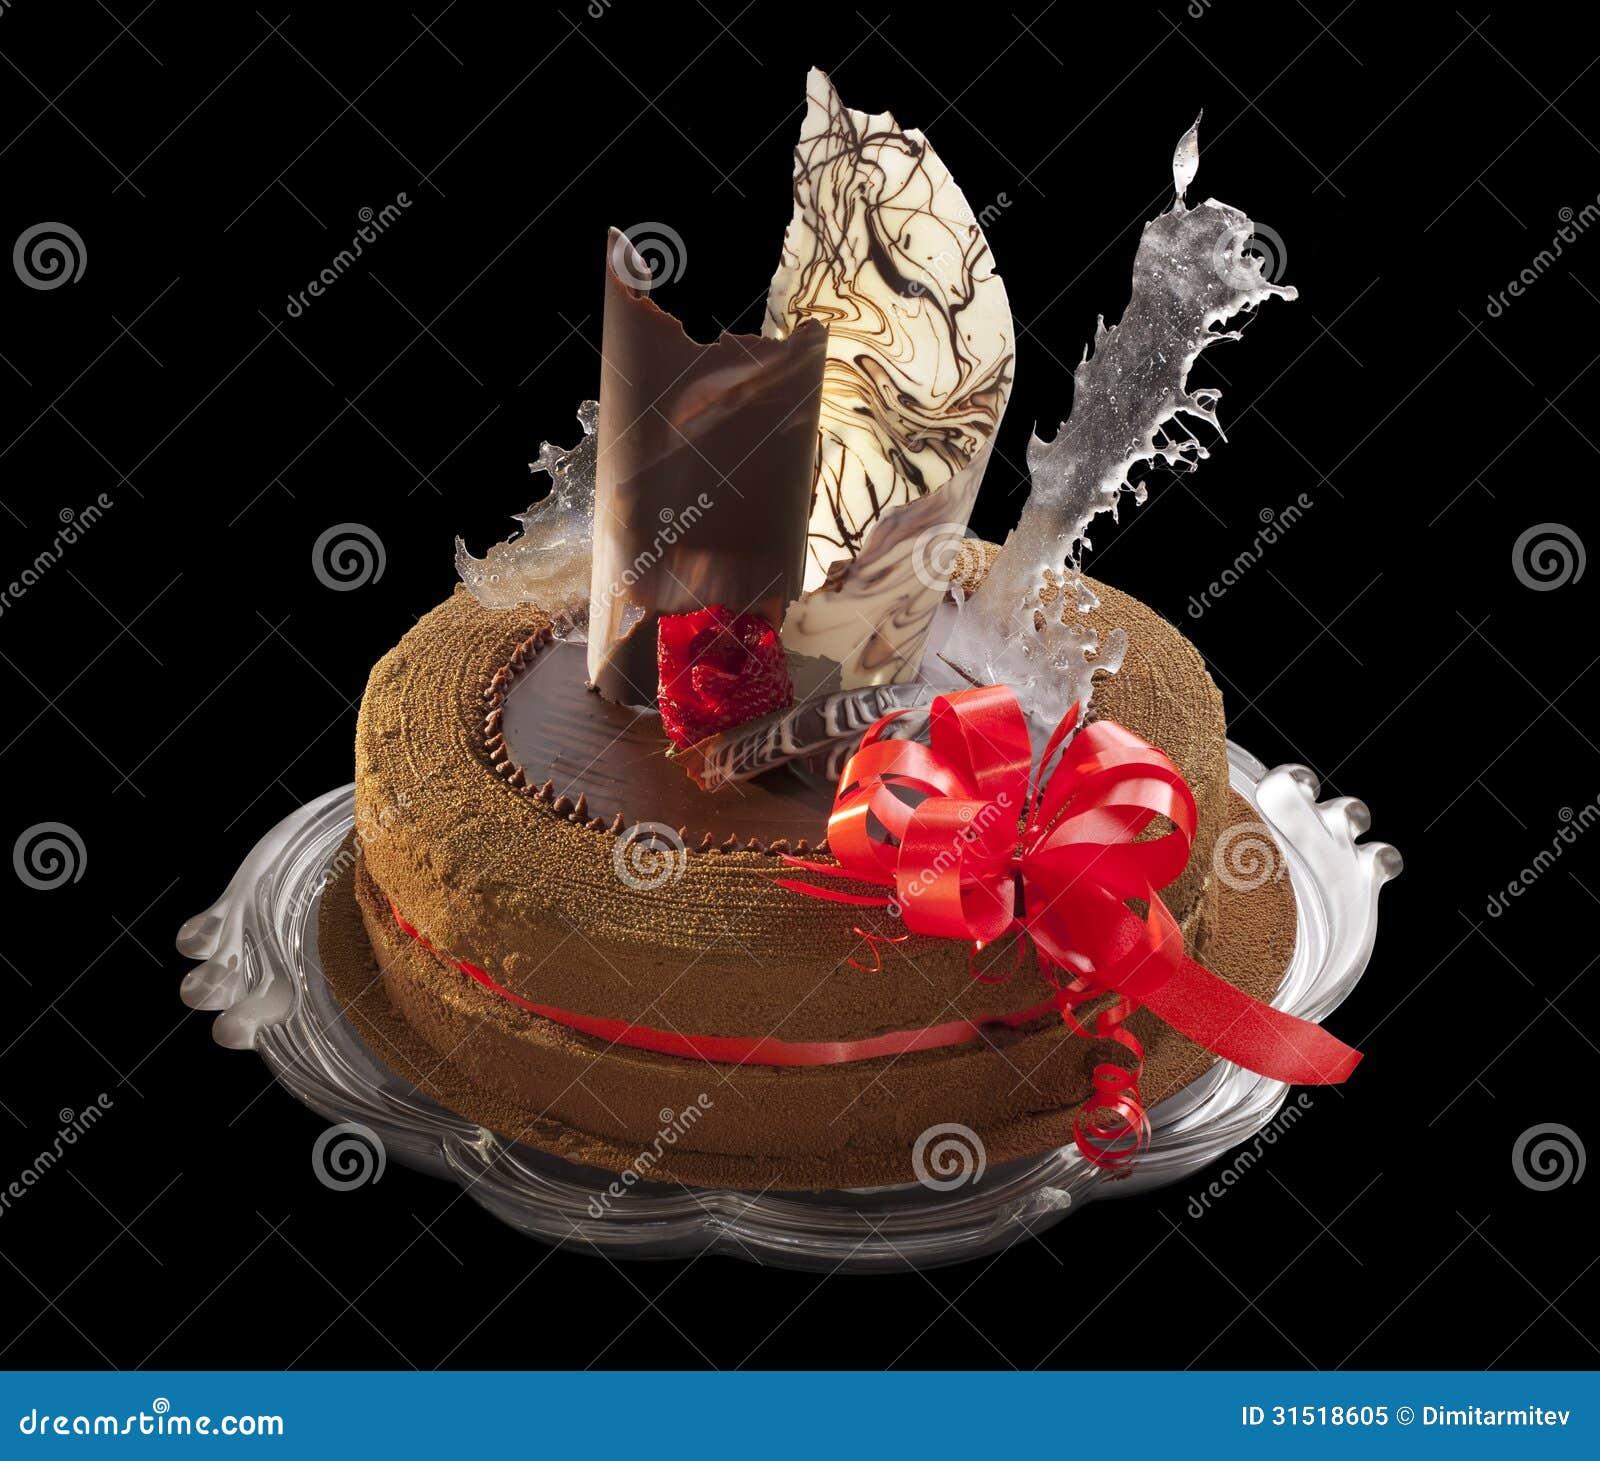 Chocolate Cake With Decoration Stock Image Image 31518605